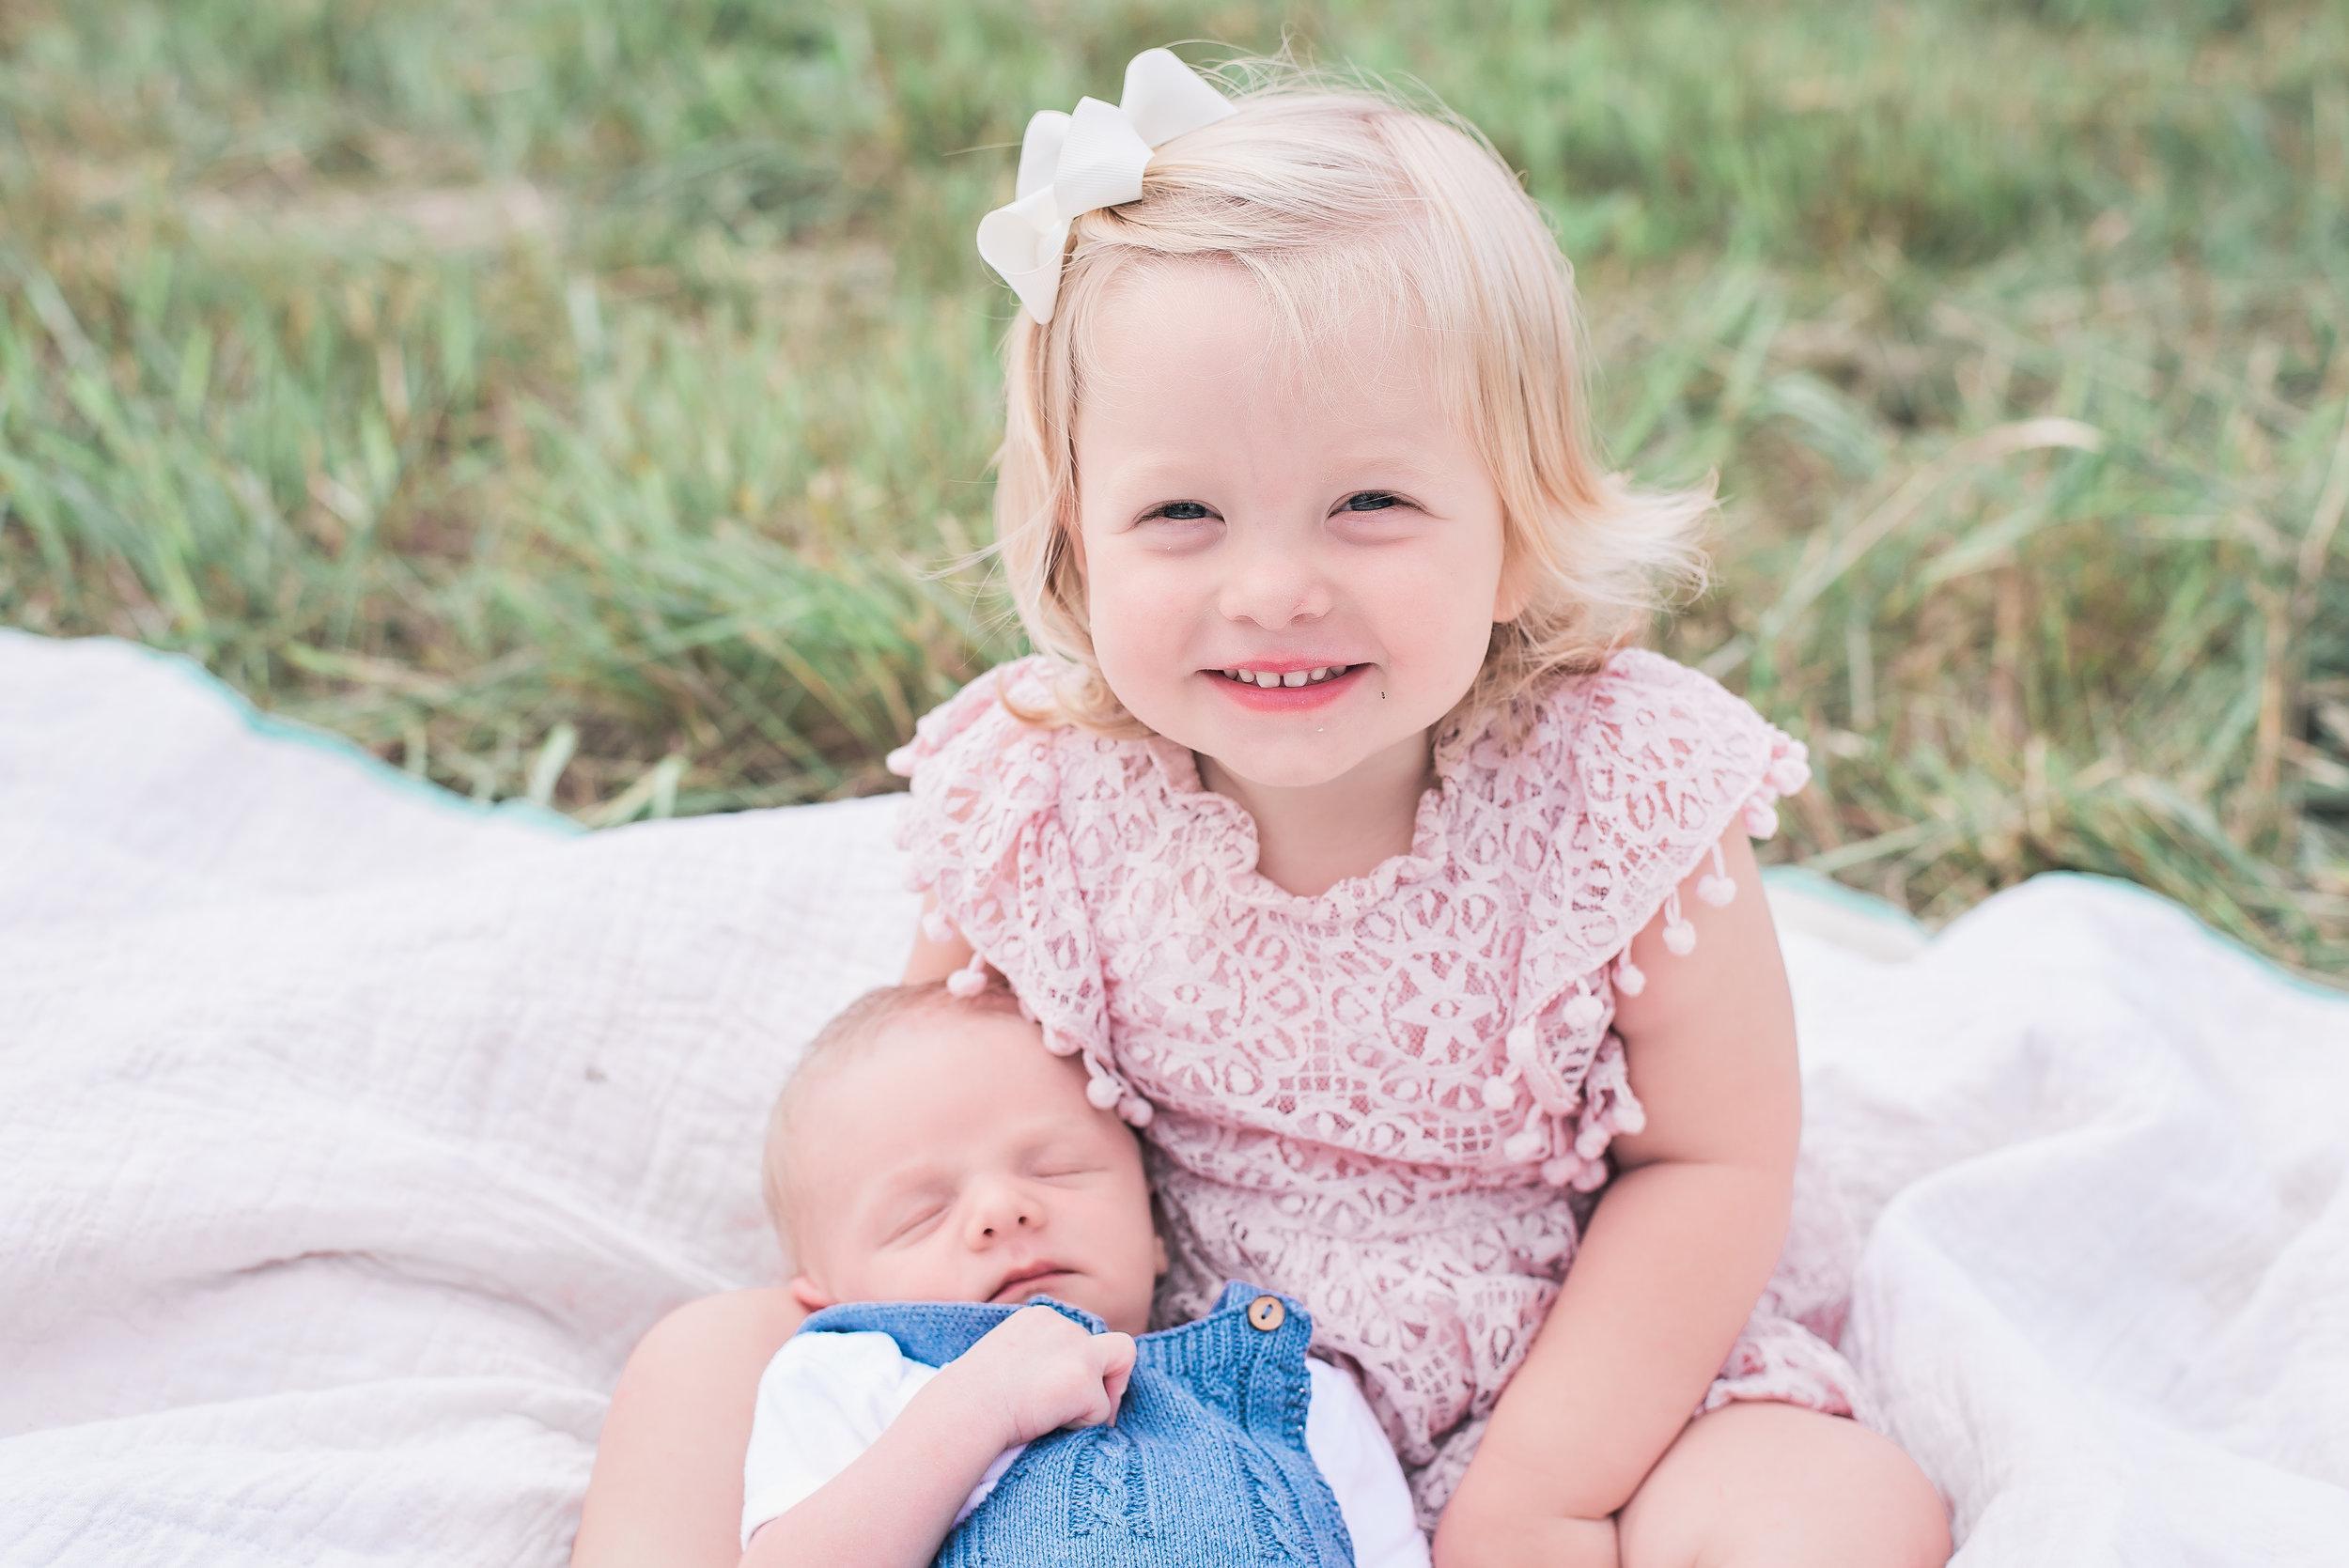 newborn sibling shot outdoors